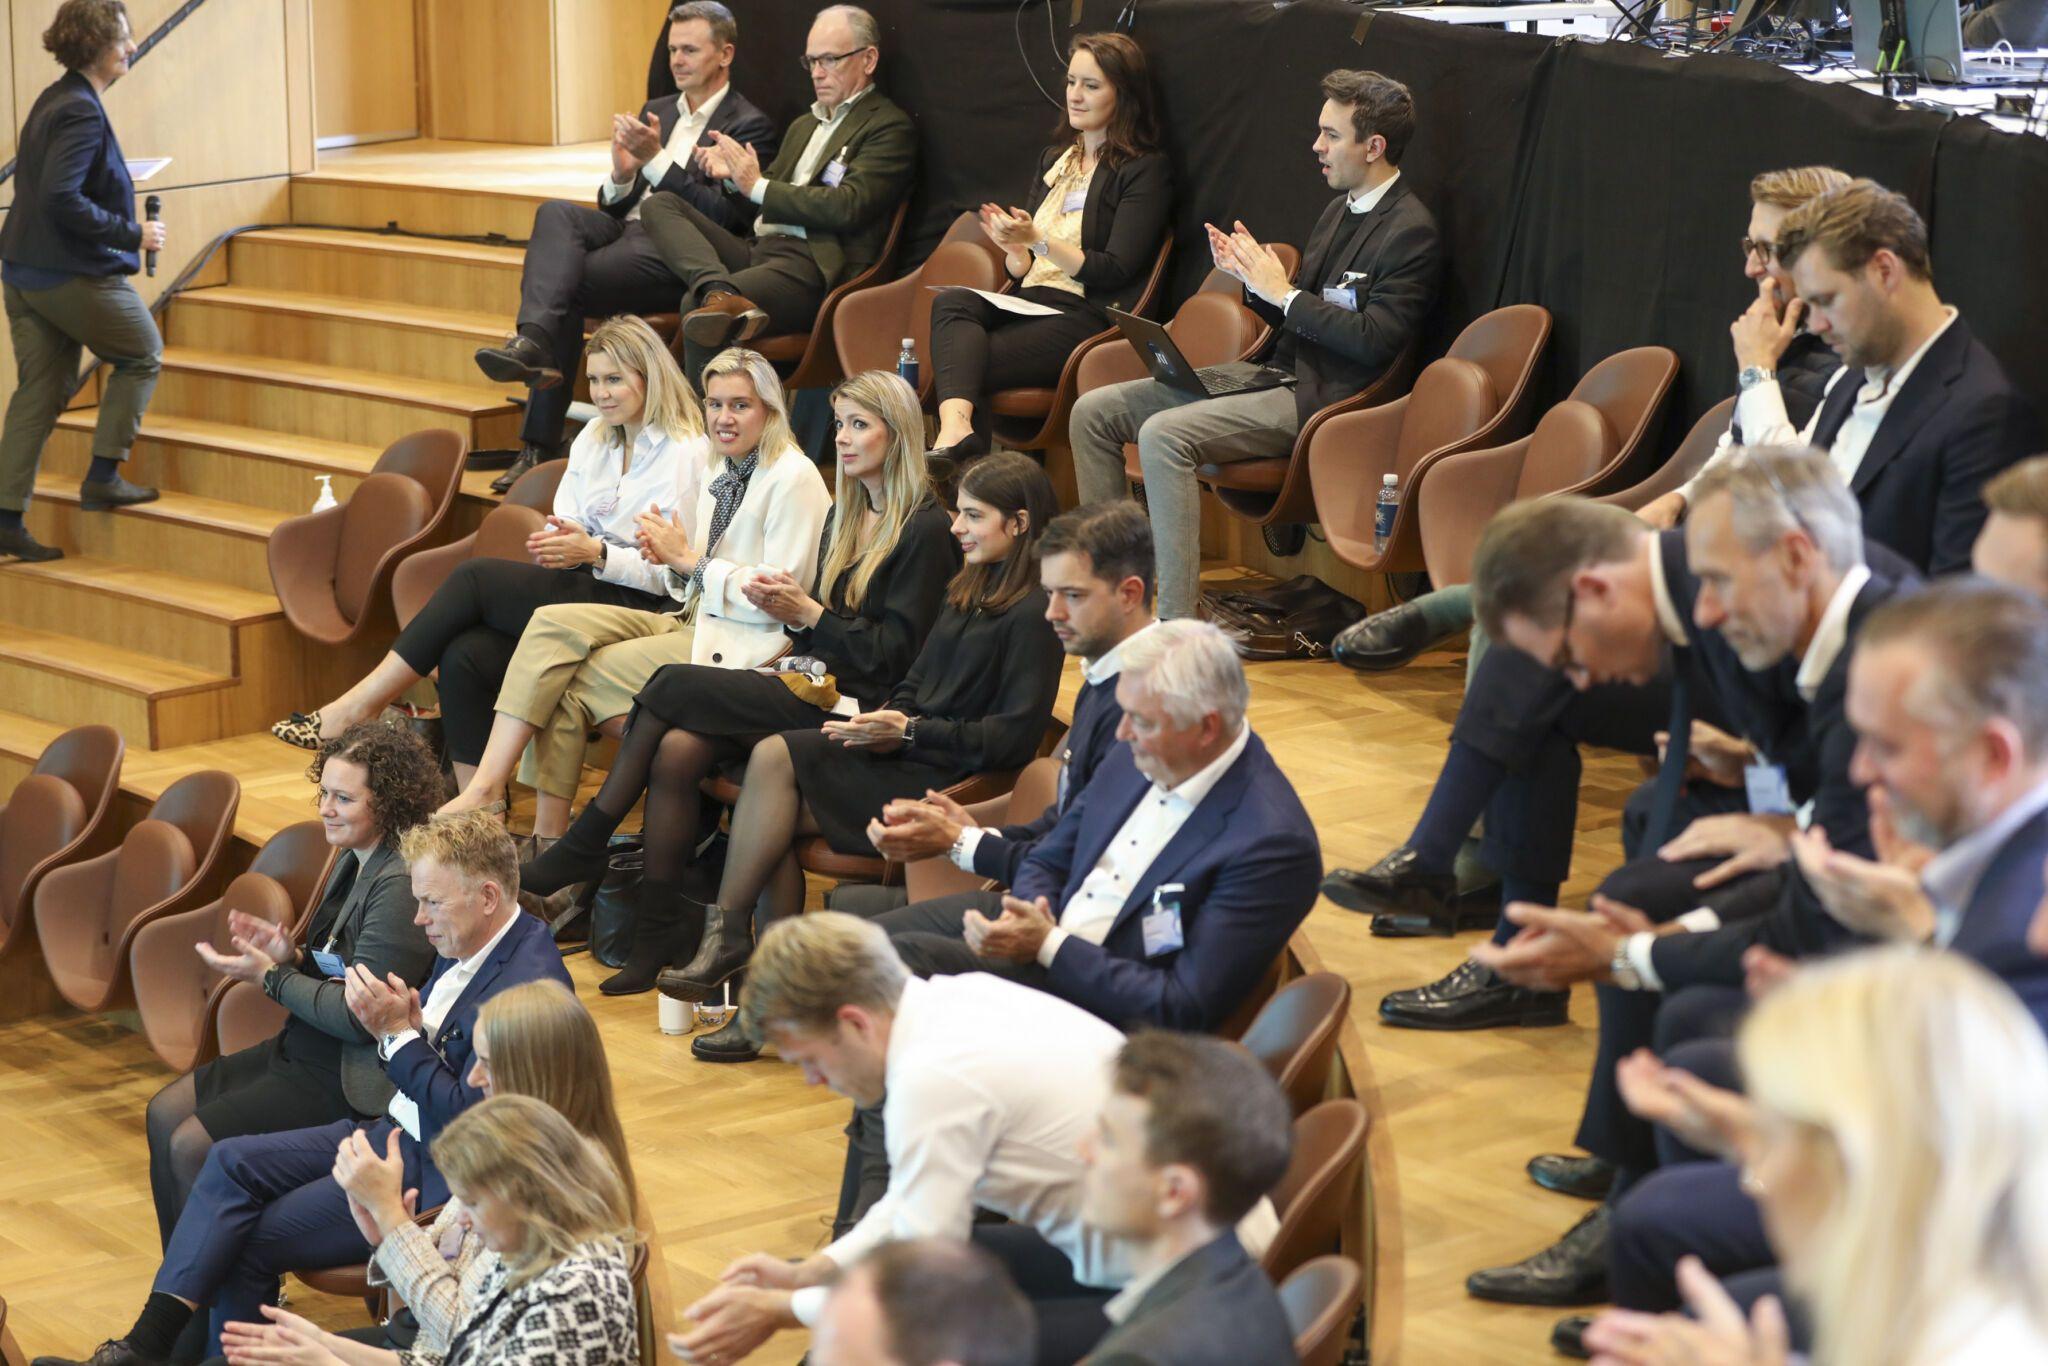 DIRFdagen_Audience_end of session,